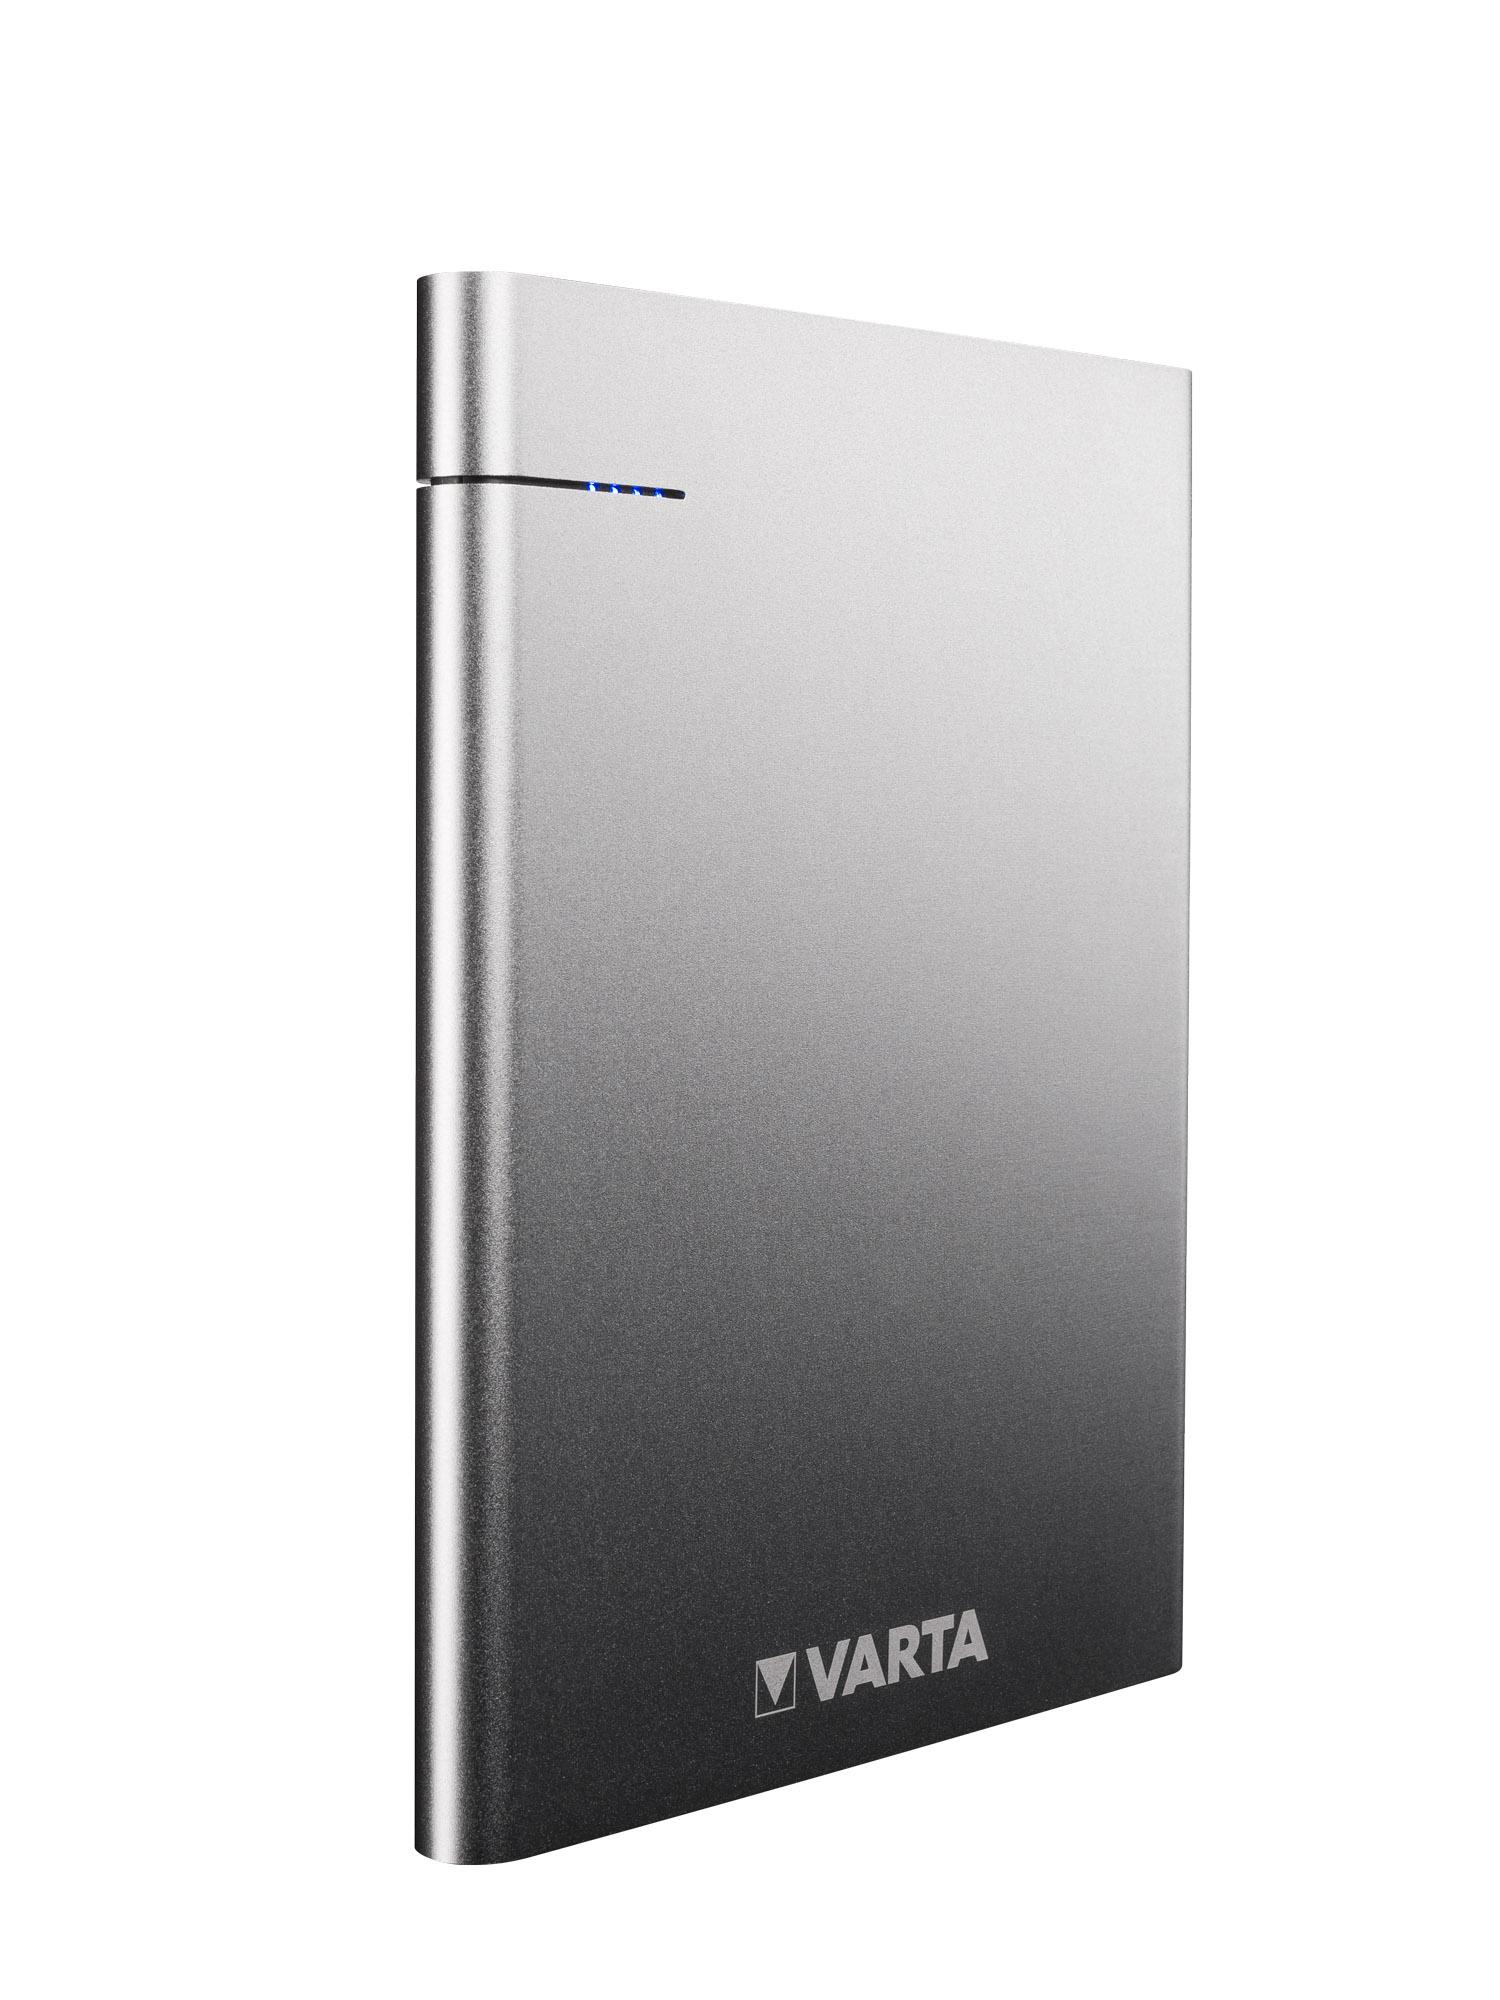 Varta Slim Power Bank má USB-C a stylový design